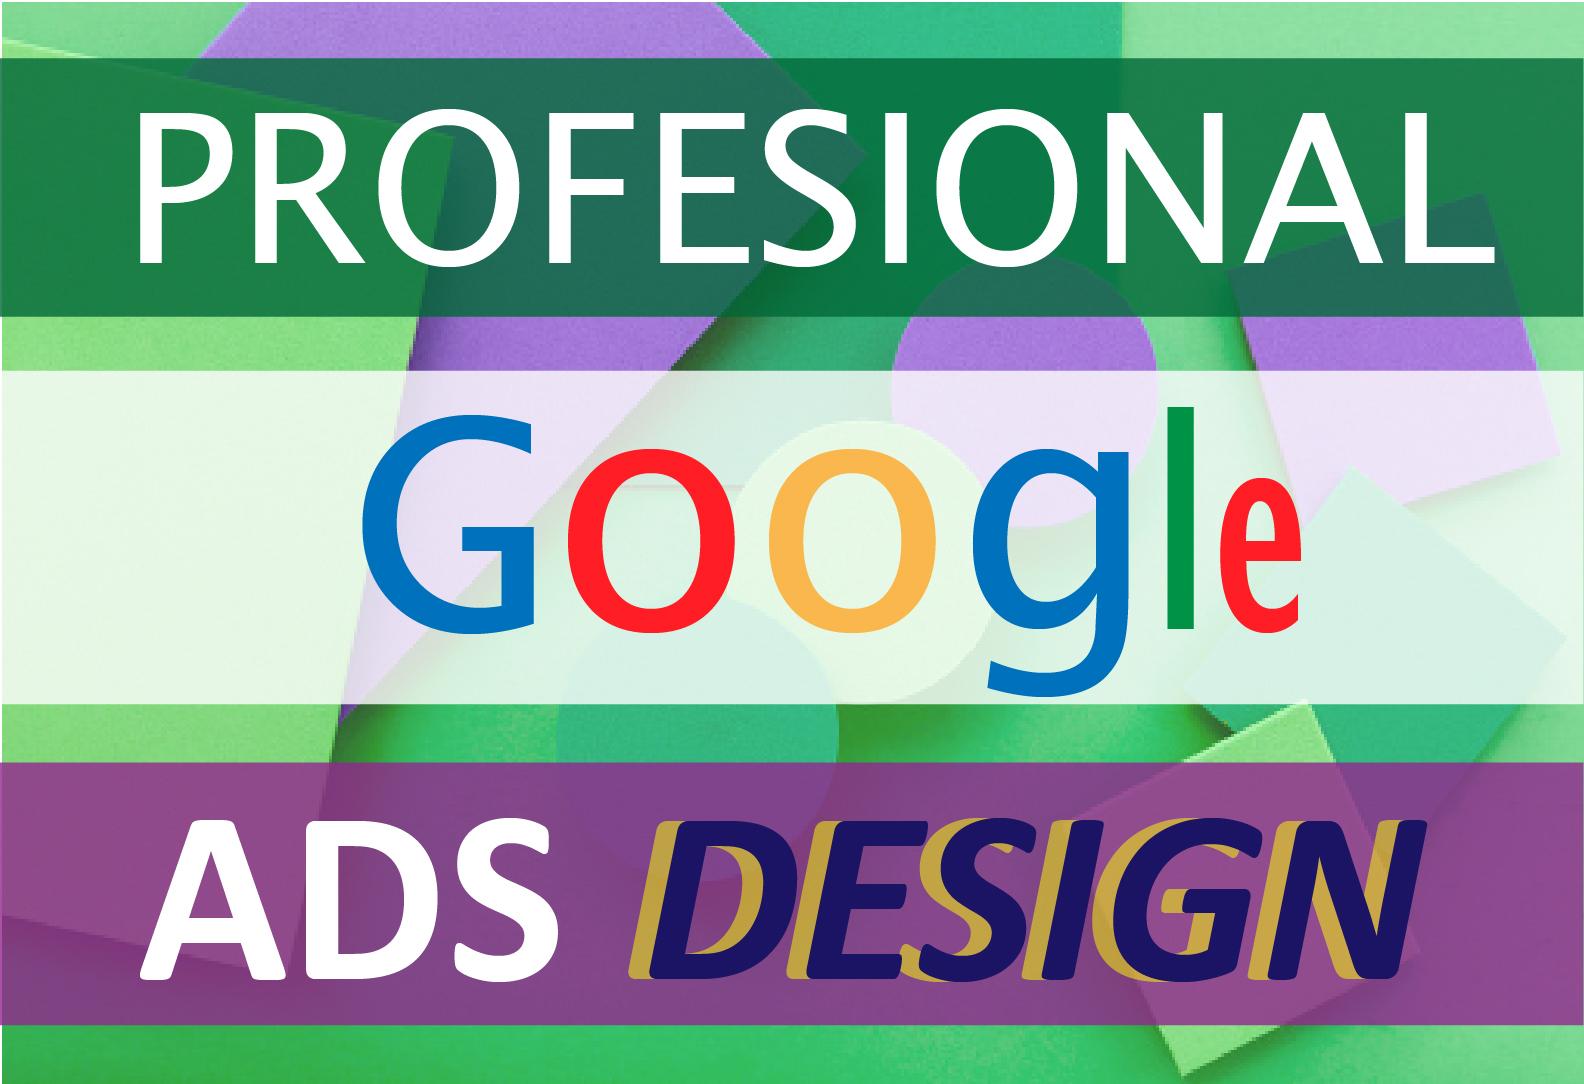 I will create the PROFESSIONAL GOOGLE ADS DESIGN